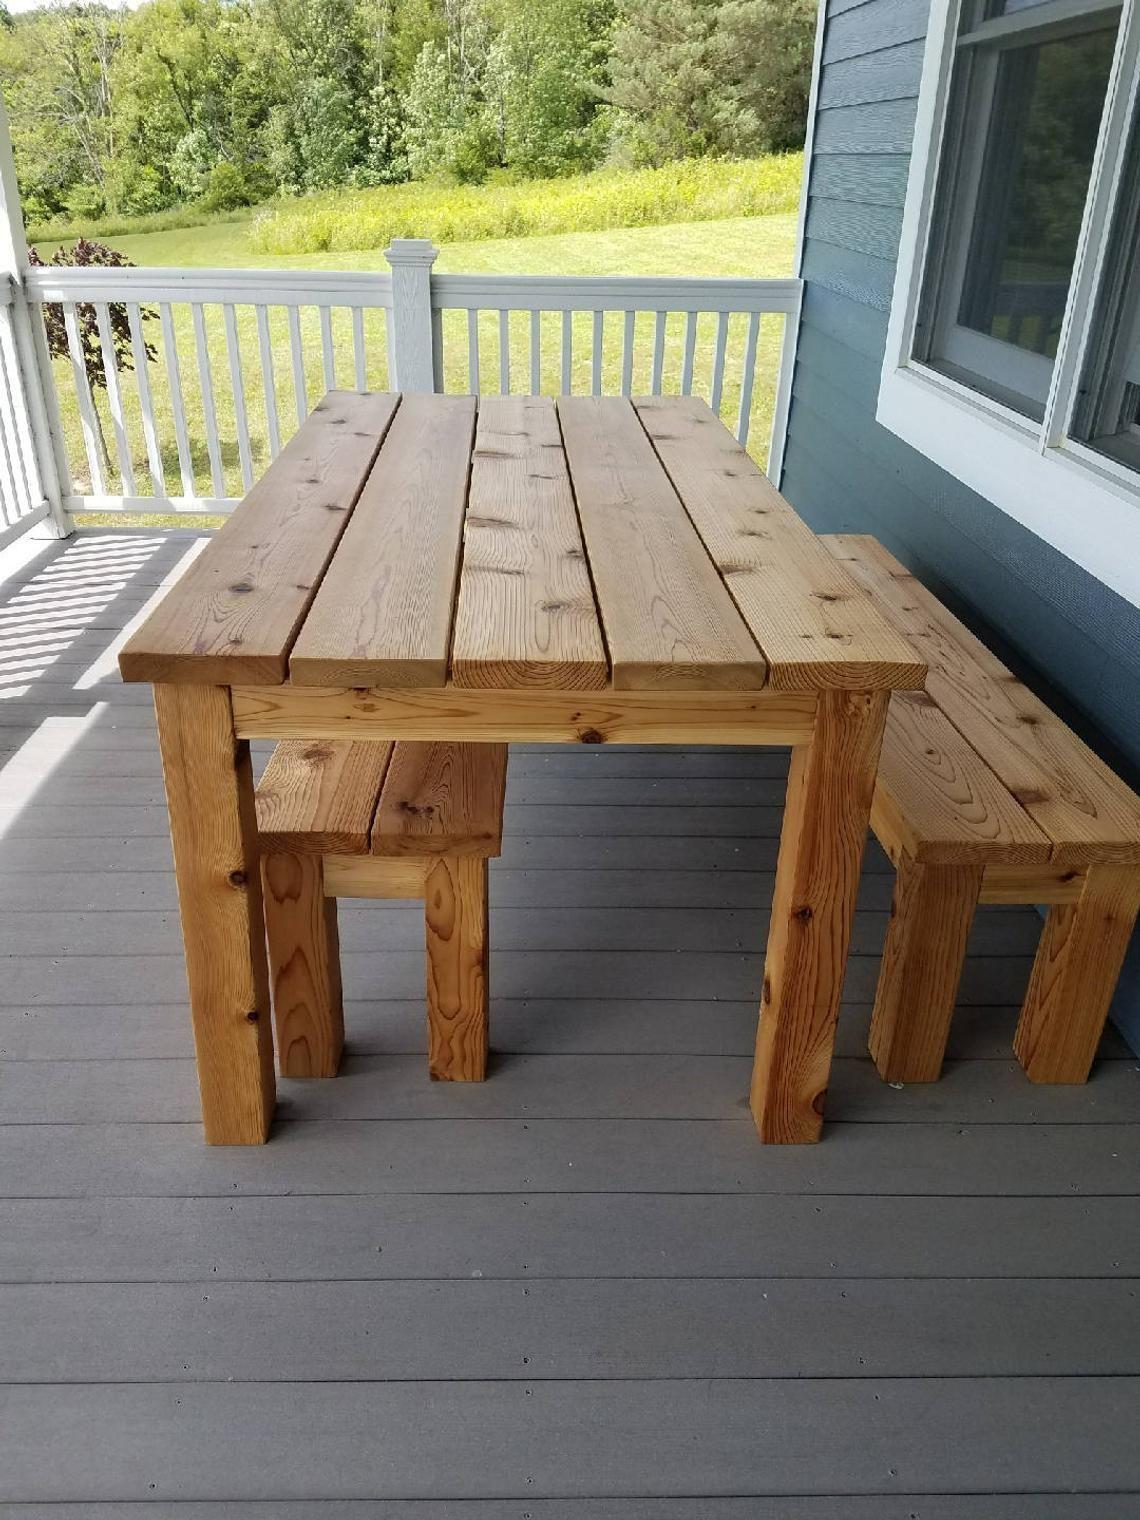 Groovy Outdoor Cedar Picnic Table Set In 2019 Tables Wooden Creativecarmelina Interior Chair Design Creativecarmelinacom